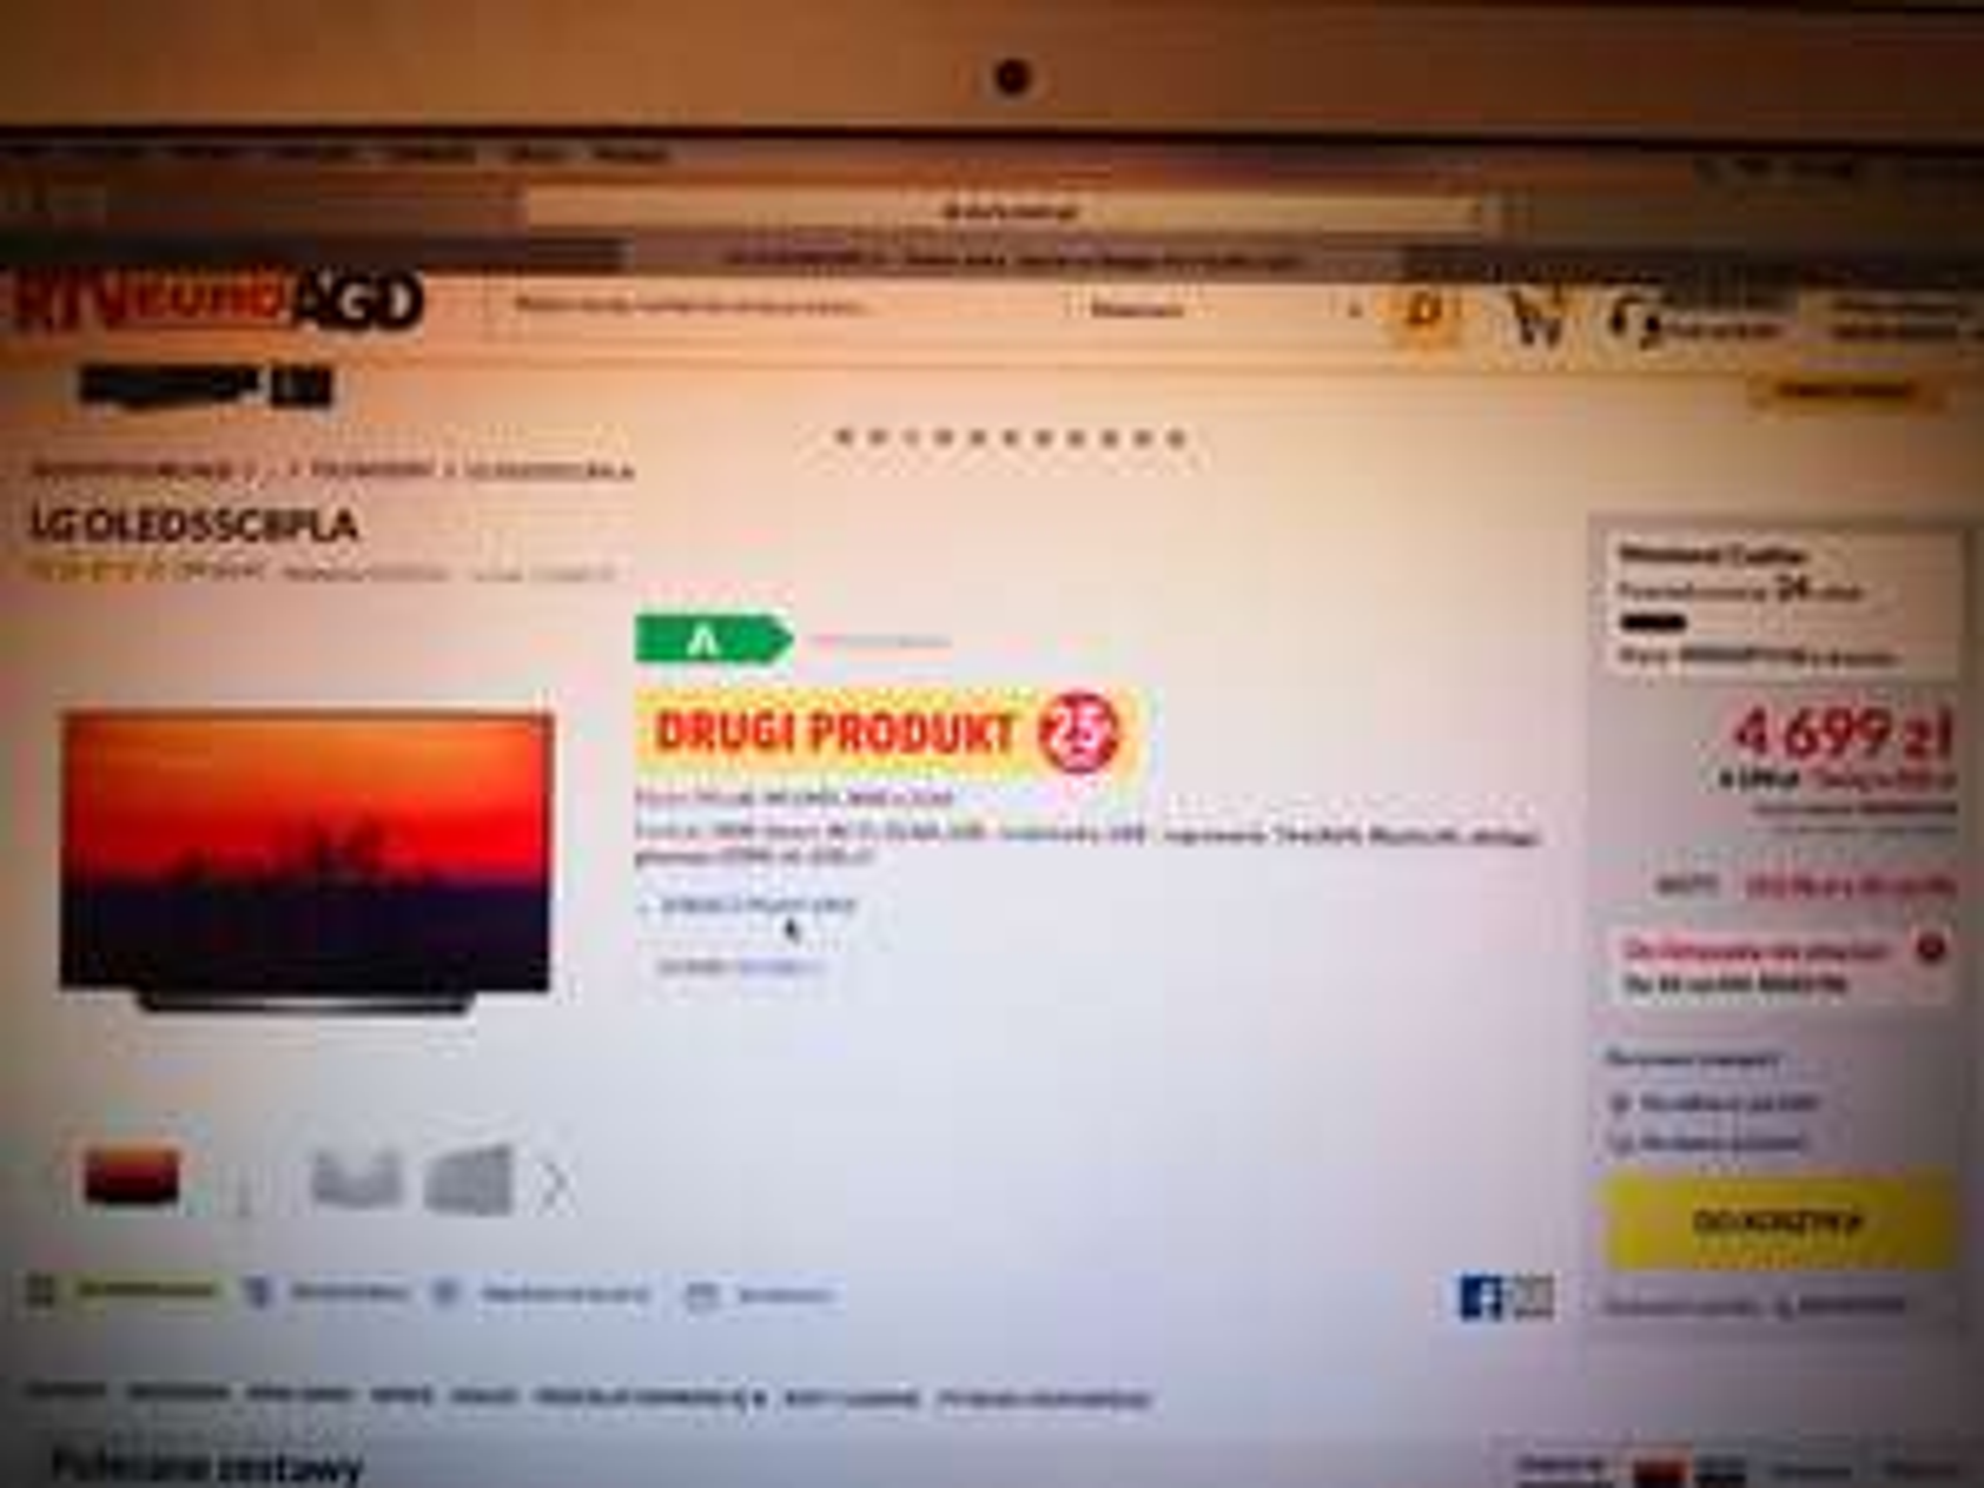 LG OLED 55c8 Absolutny Sztos Telewizor ZA 4699